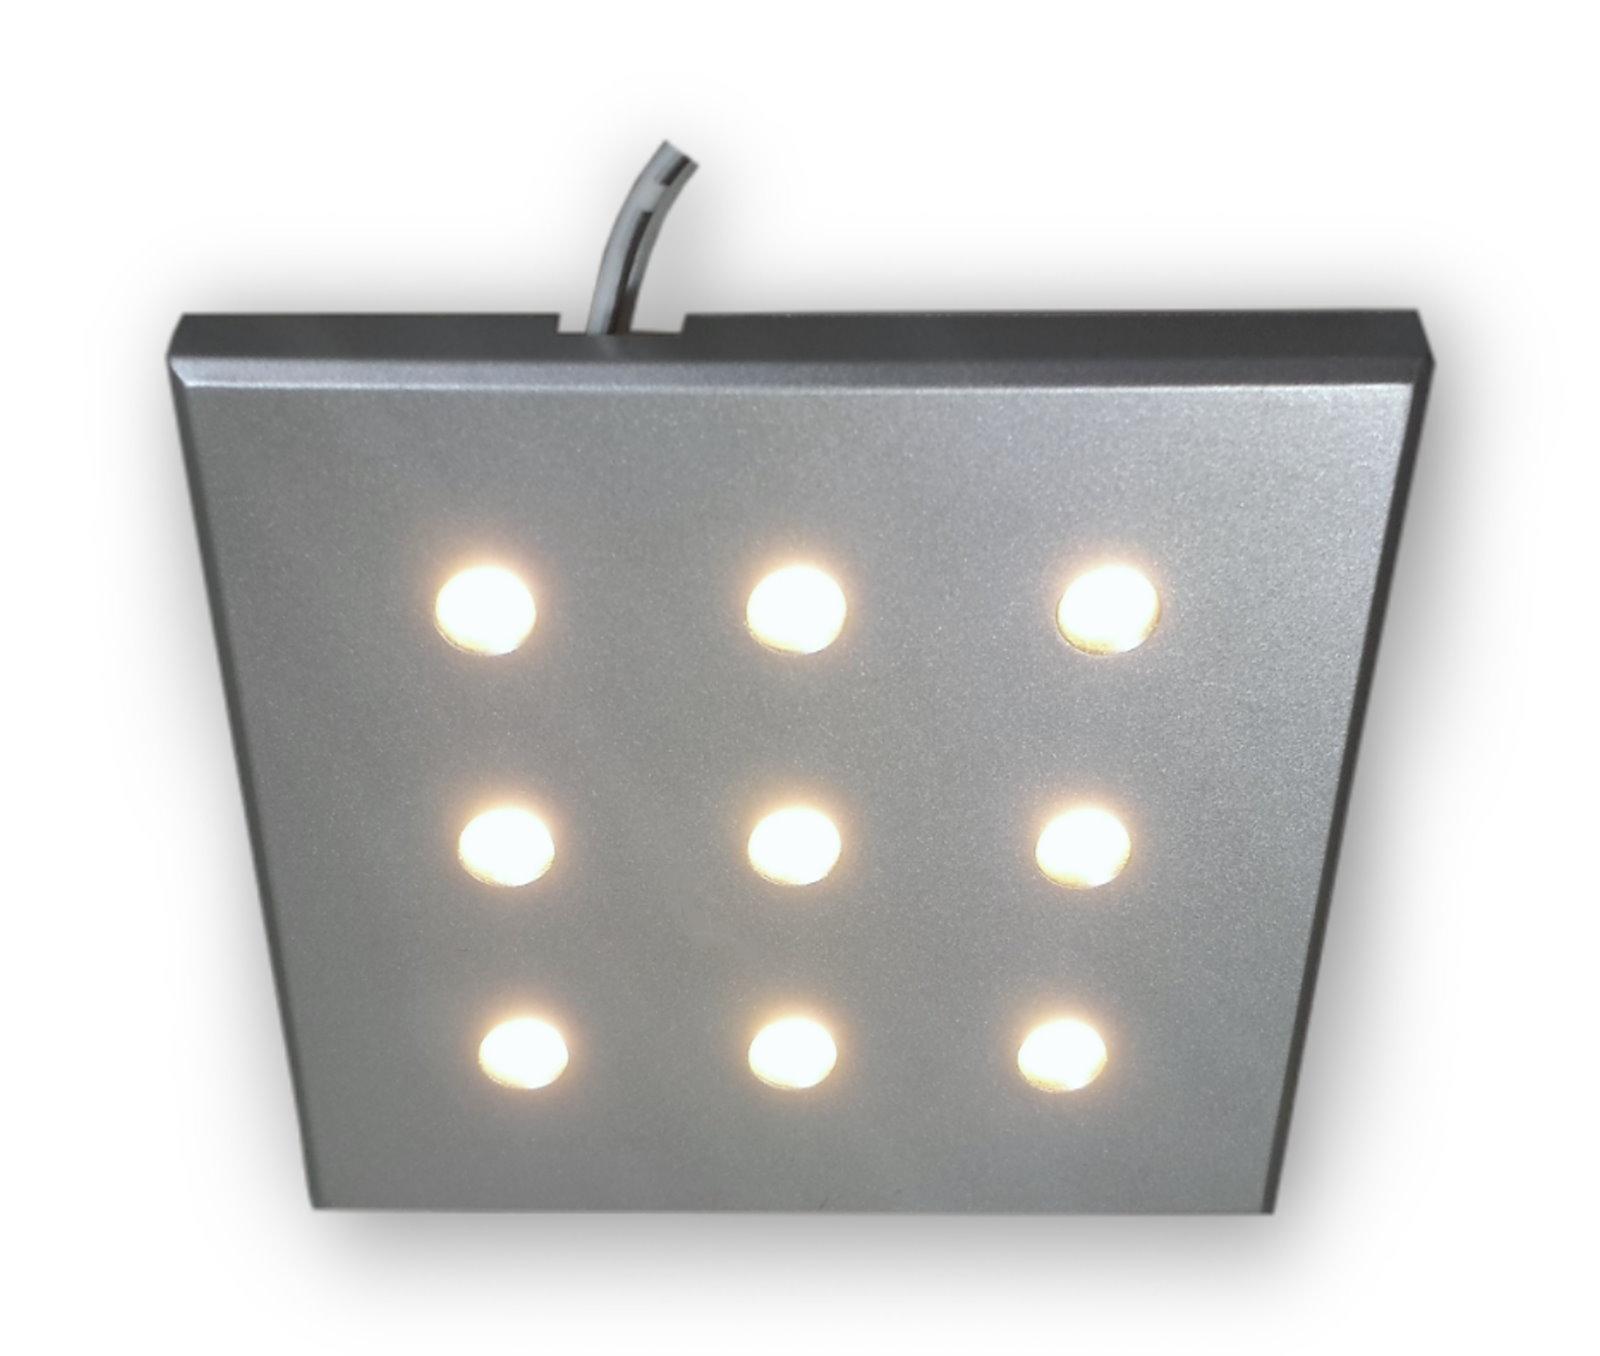 3x 2 2w 12v Led Leuchten Set Mobellampen Unterbau Strahler